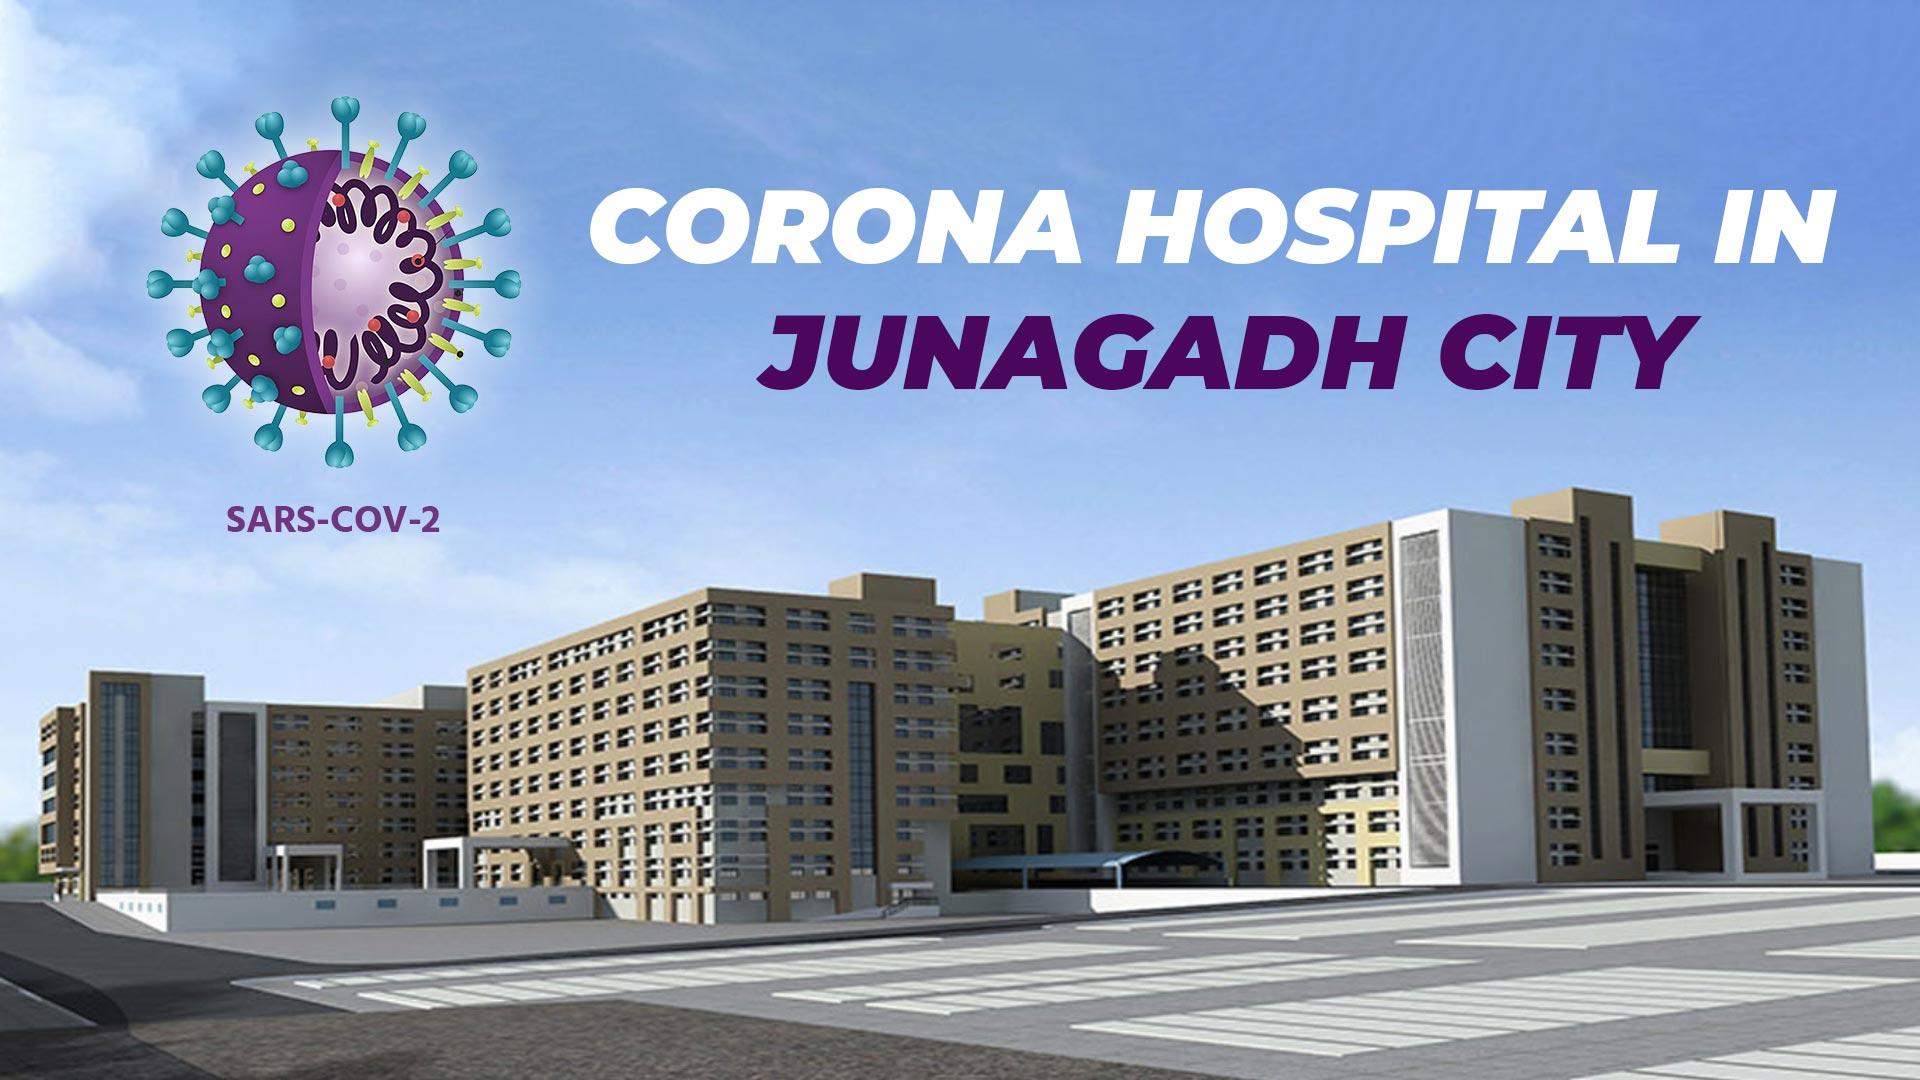 Corona Hospital in Junagadh City